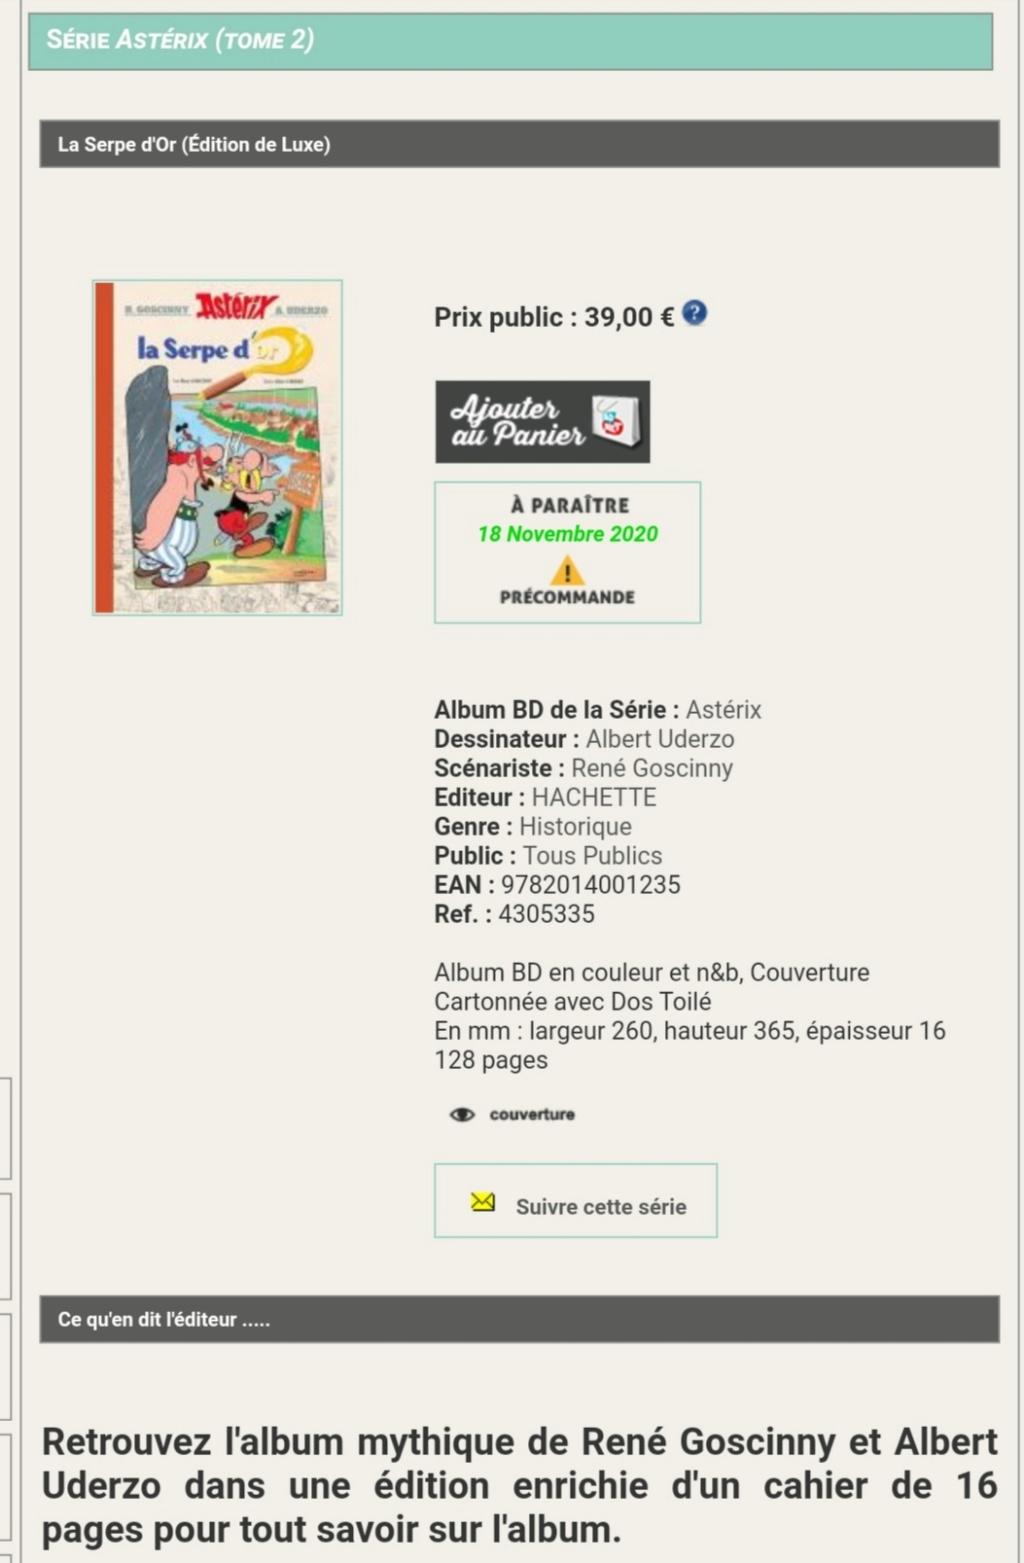 LA SERPE D'OR le 1er juillet !  - Page 2 Screen45